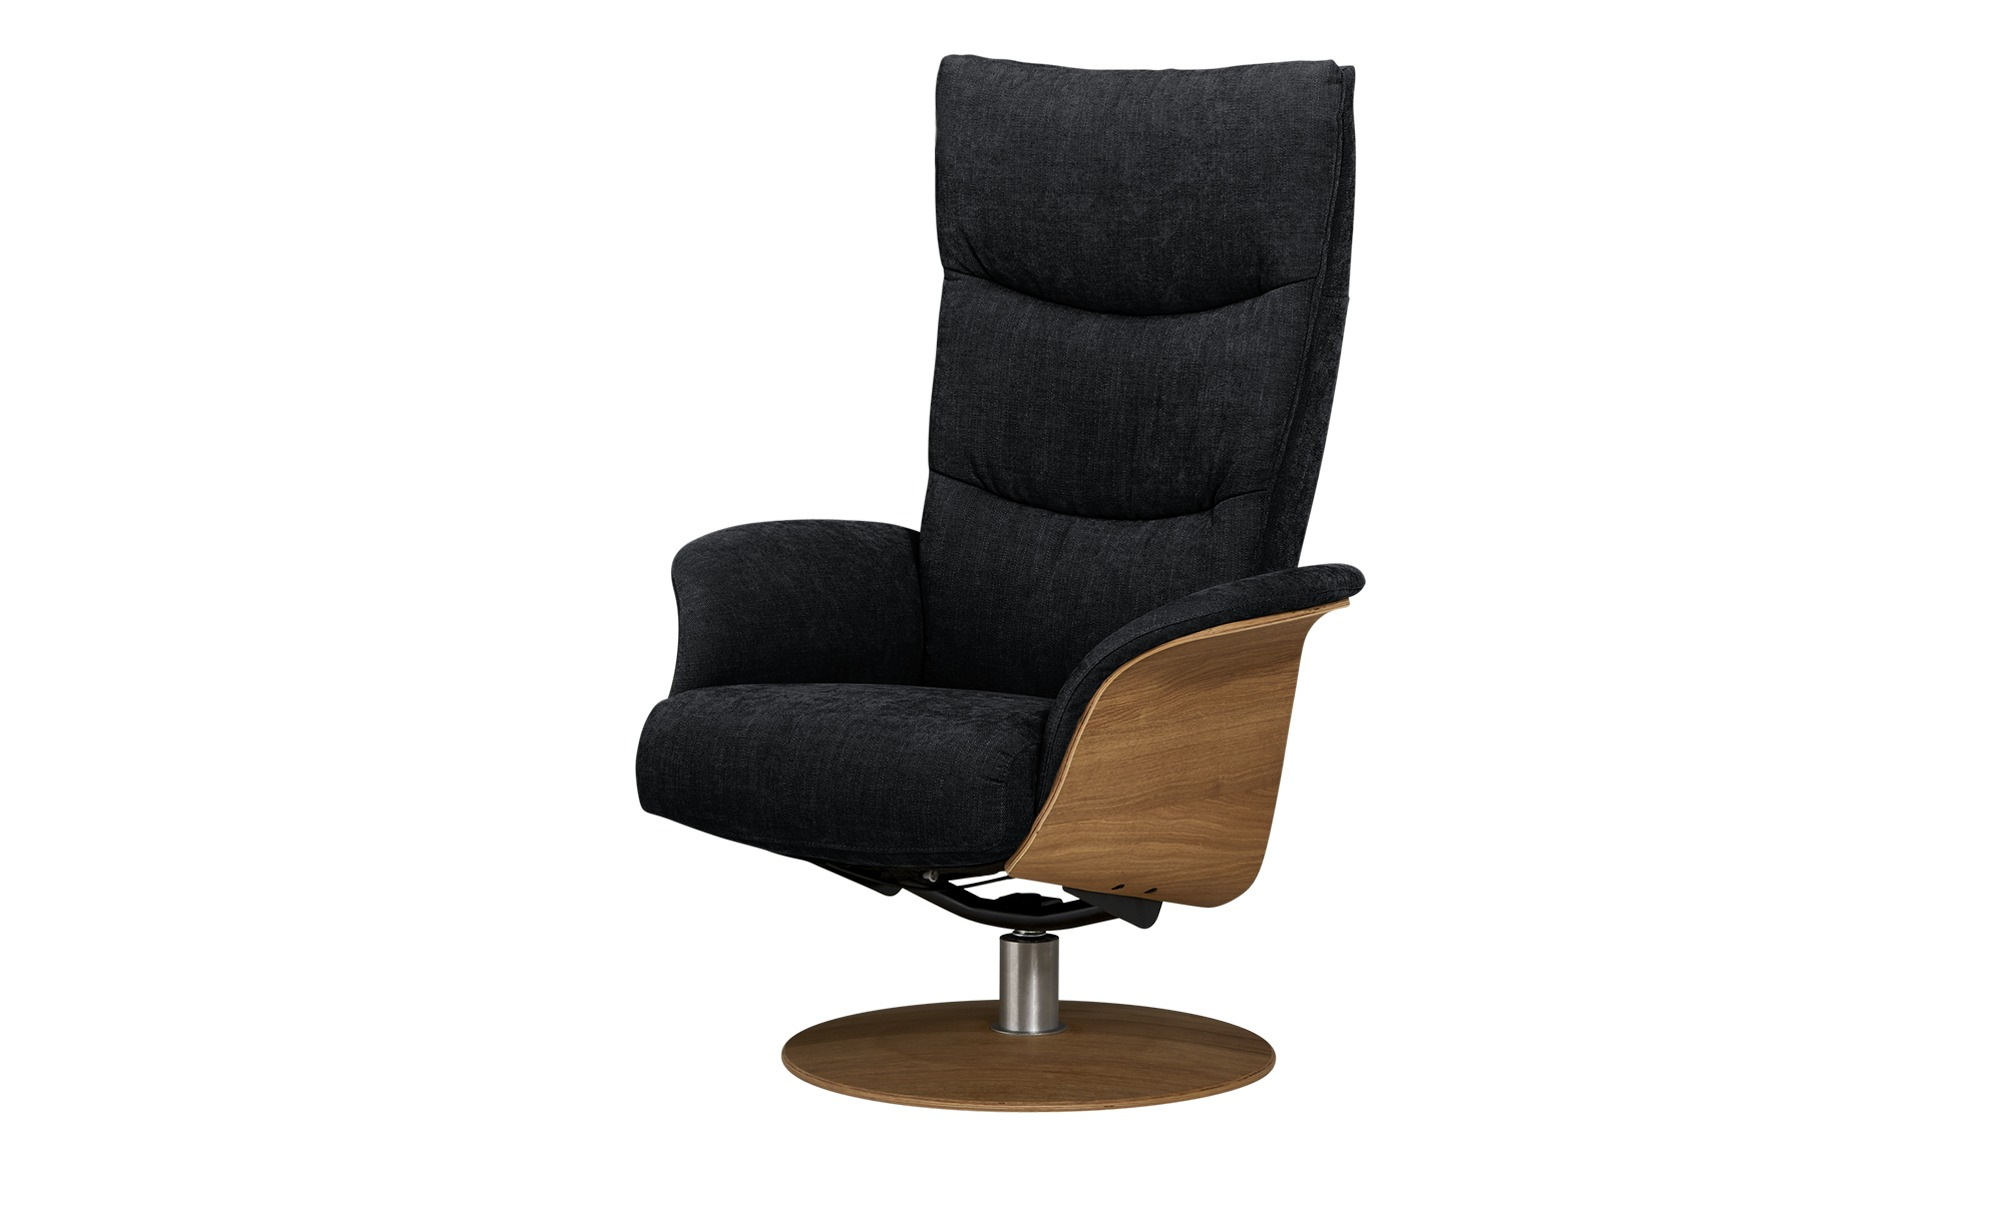 Vintage Ledersessel Einzel Sessel Design Ohrensessel